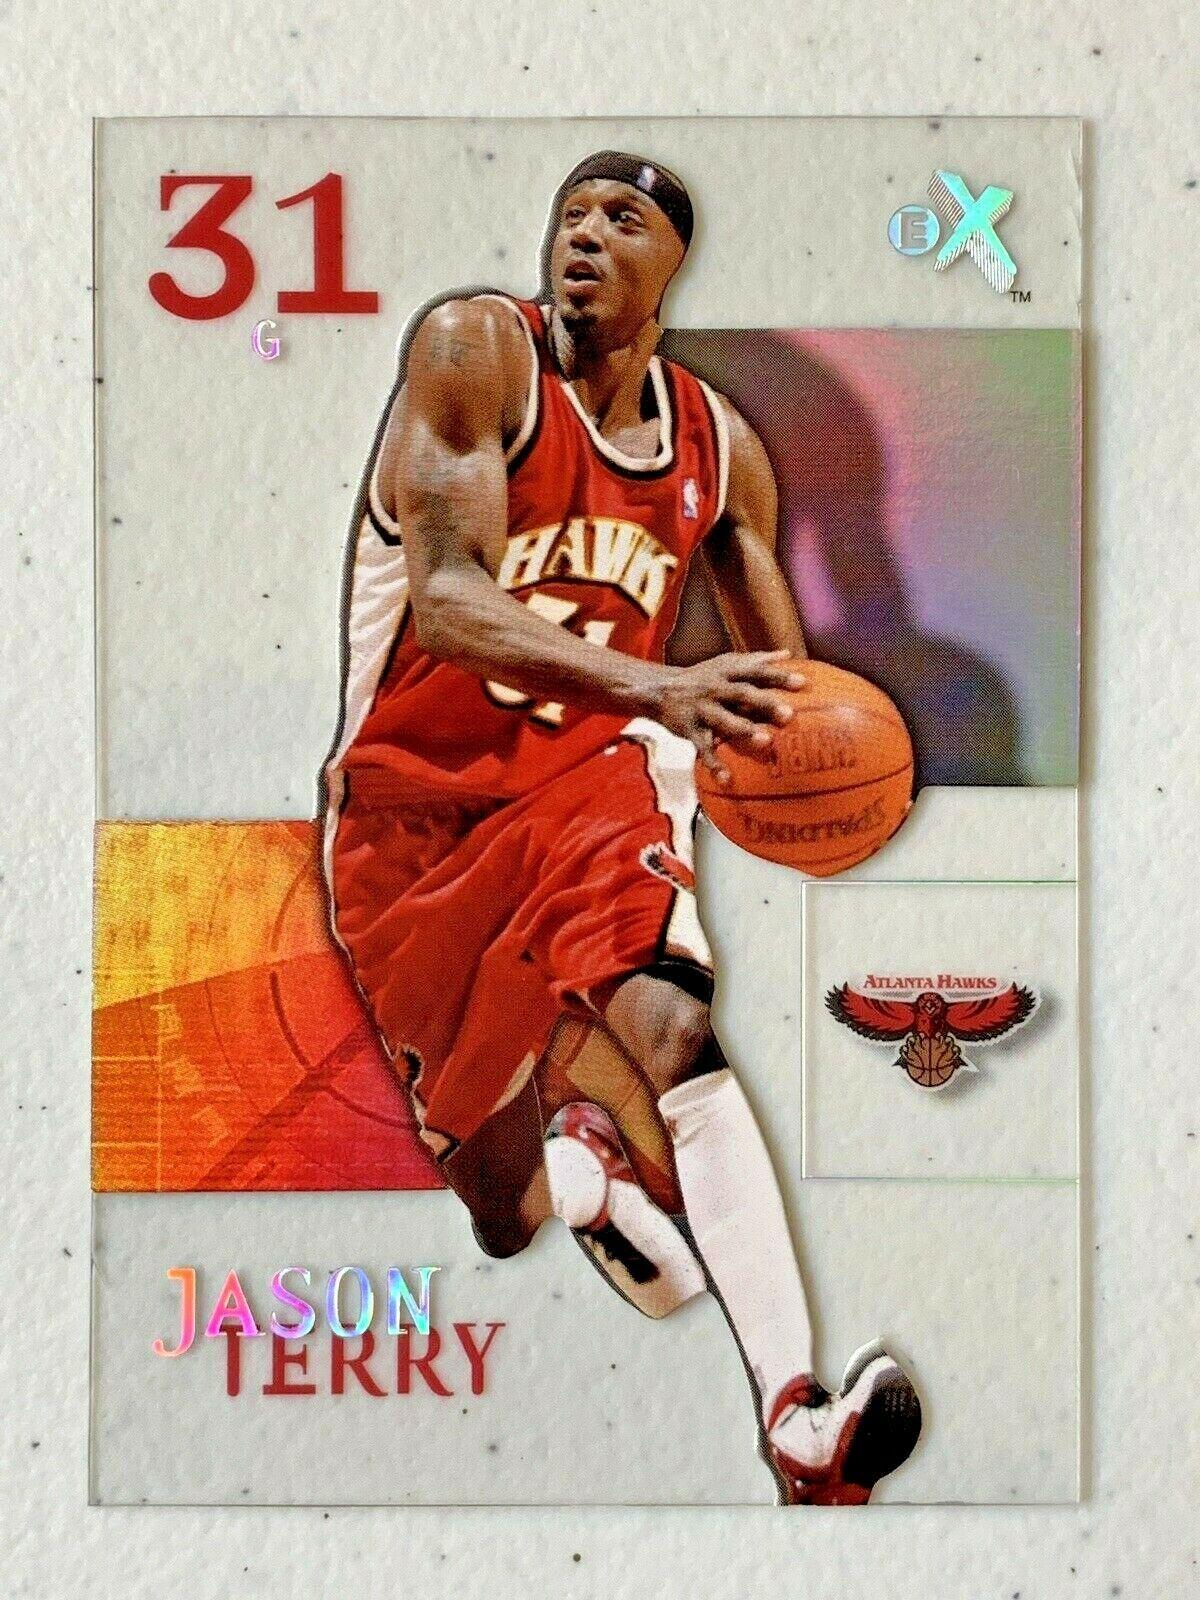 Jason Terry Now/66 #65 Atlanta Hawks Fleer Basketball Card with Hard Case 31G